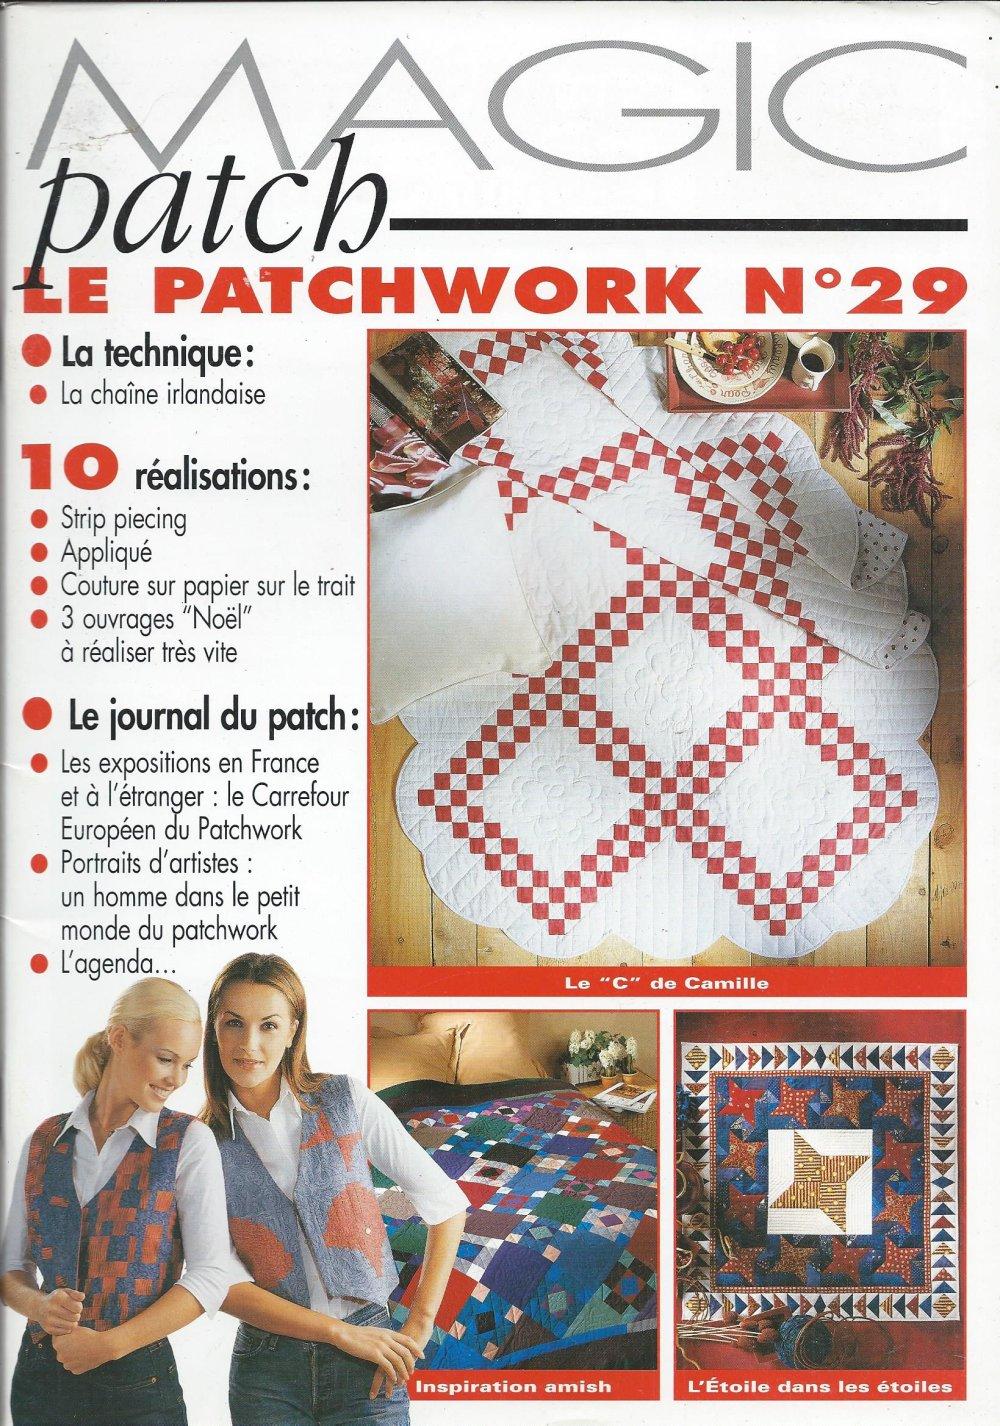 Magic patch le patchwork n°29 10 realisations noel